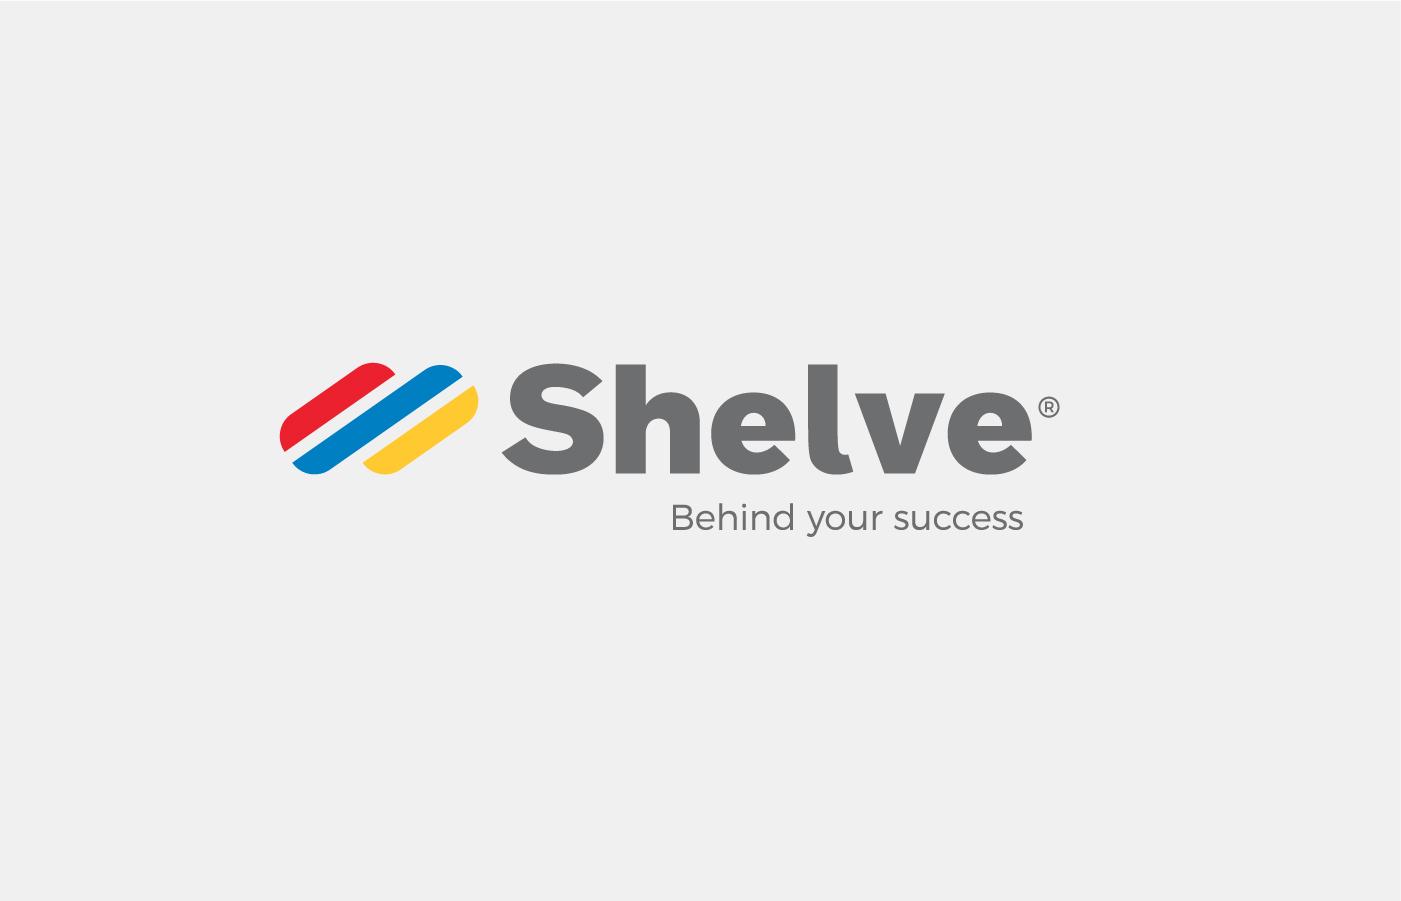 Shelve